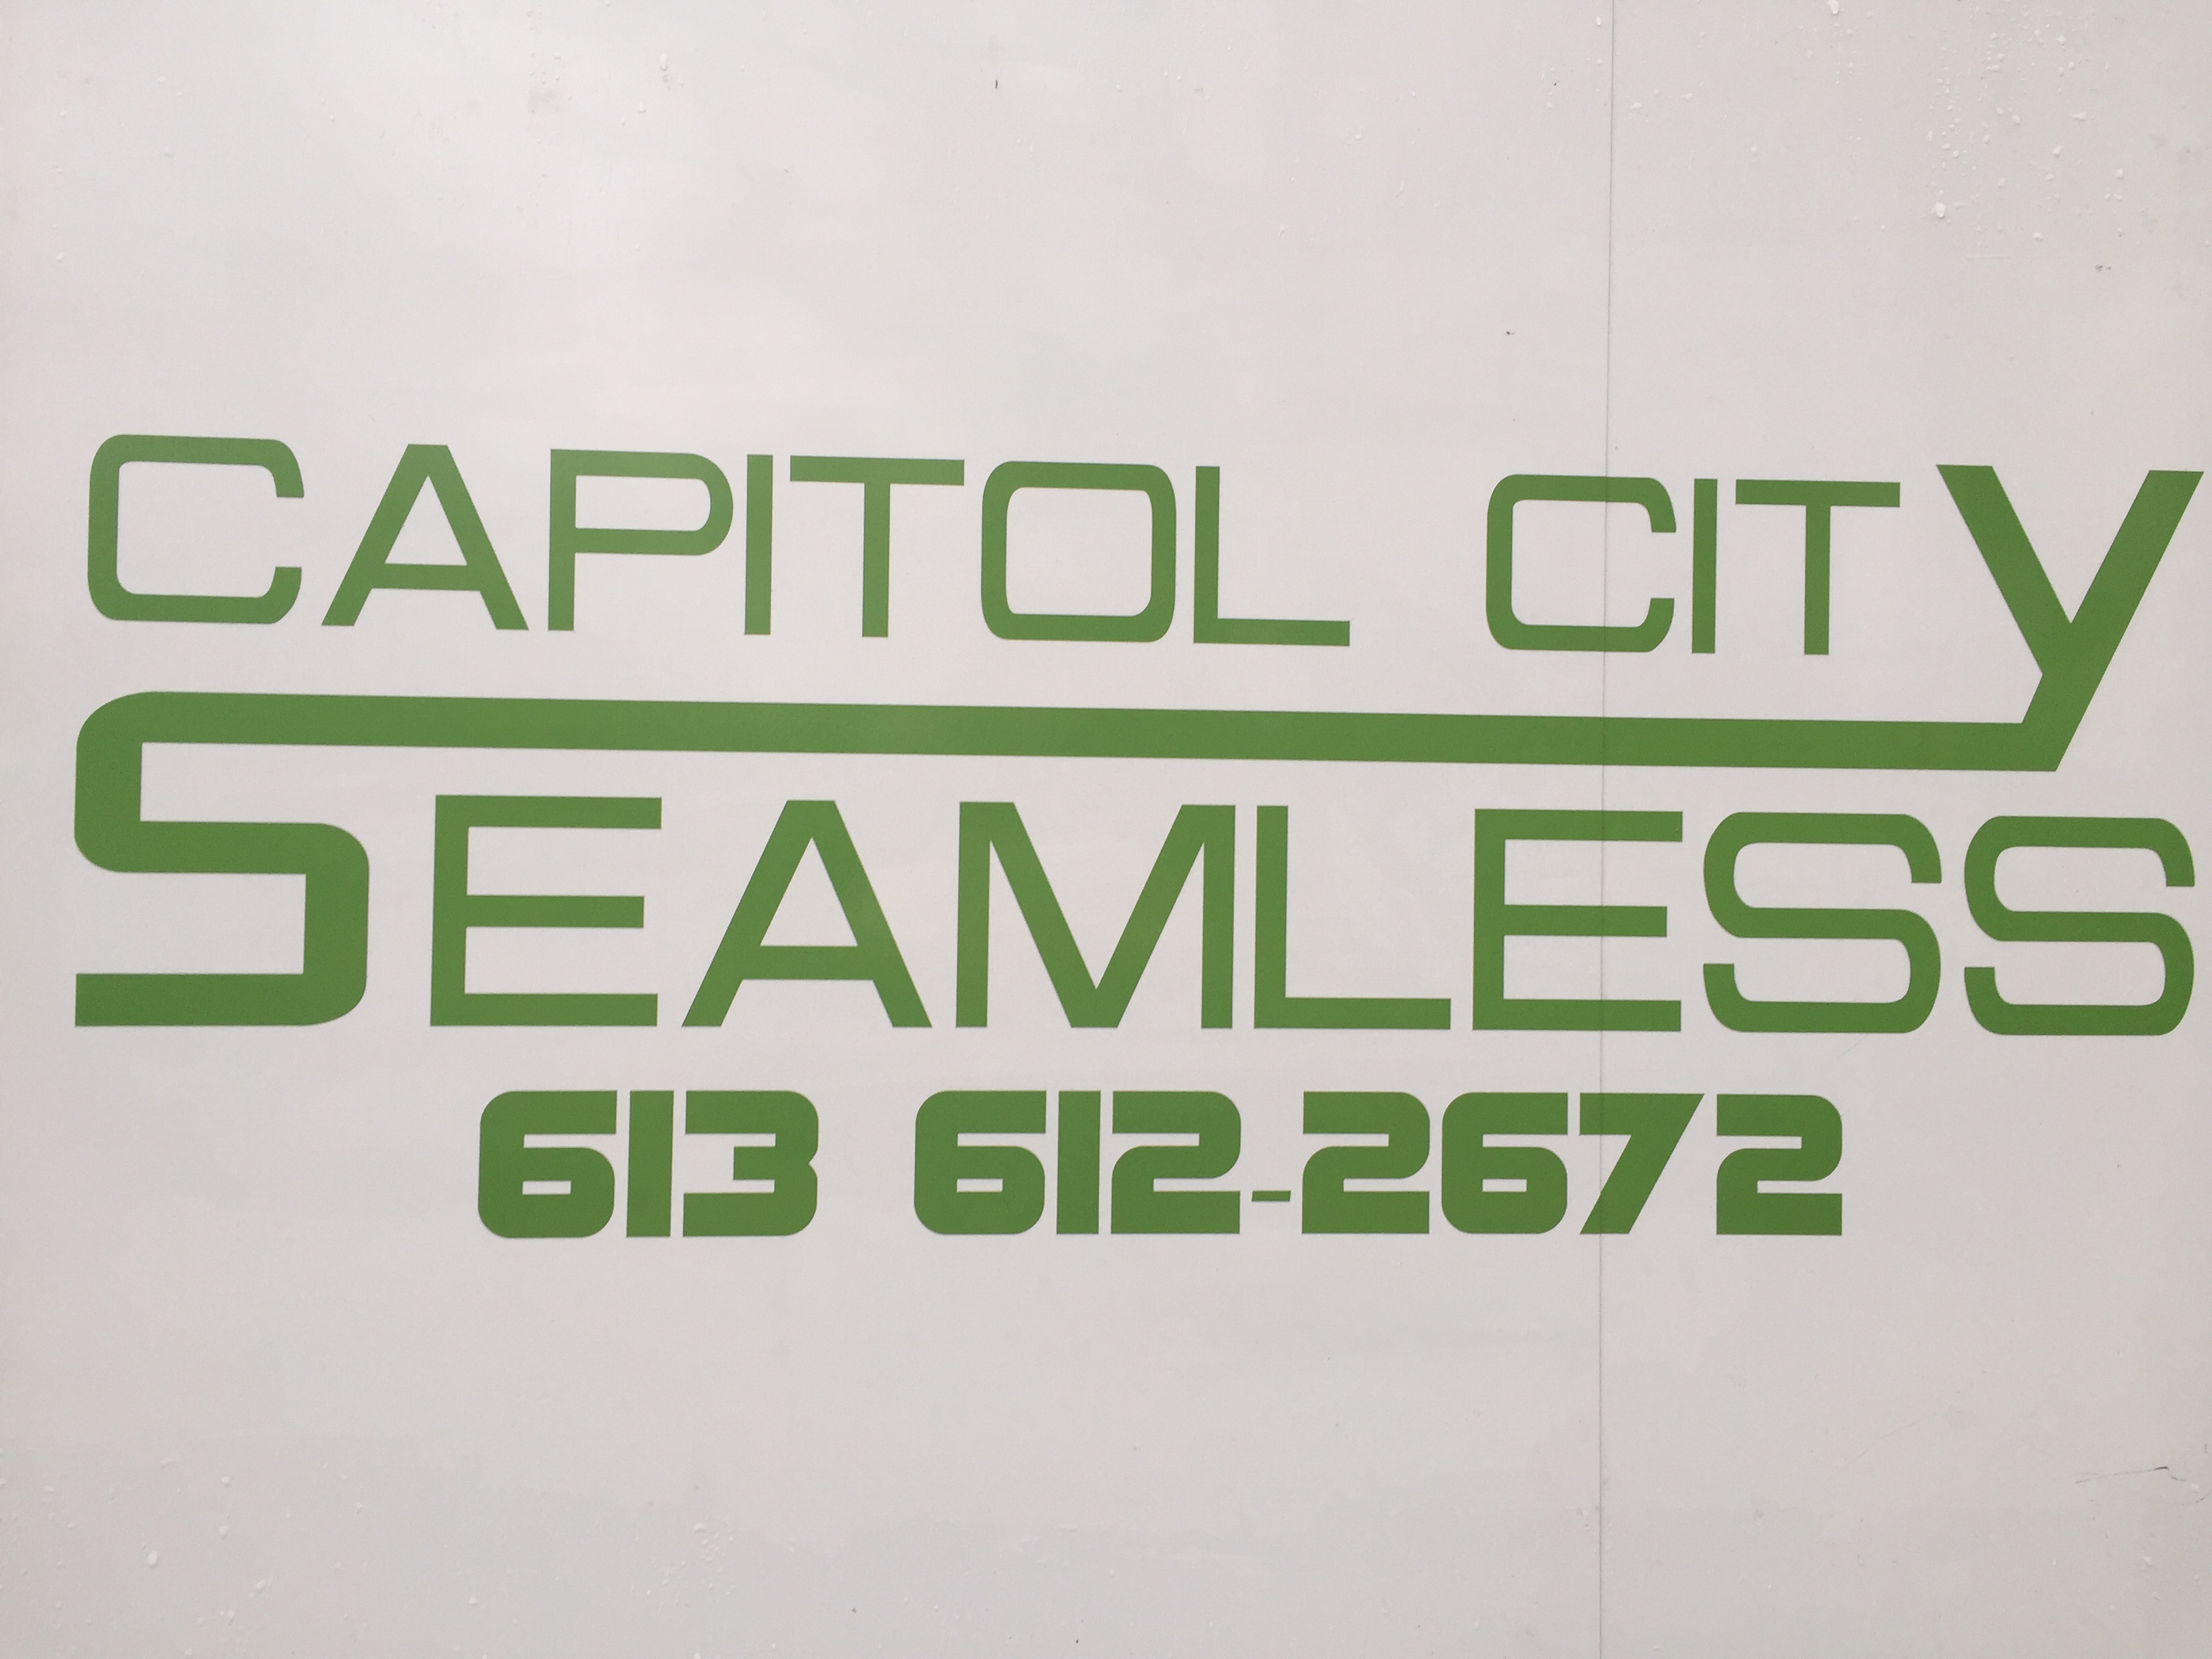 Capitol City Seamless